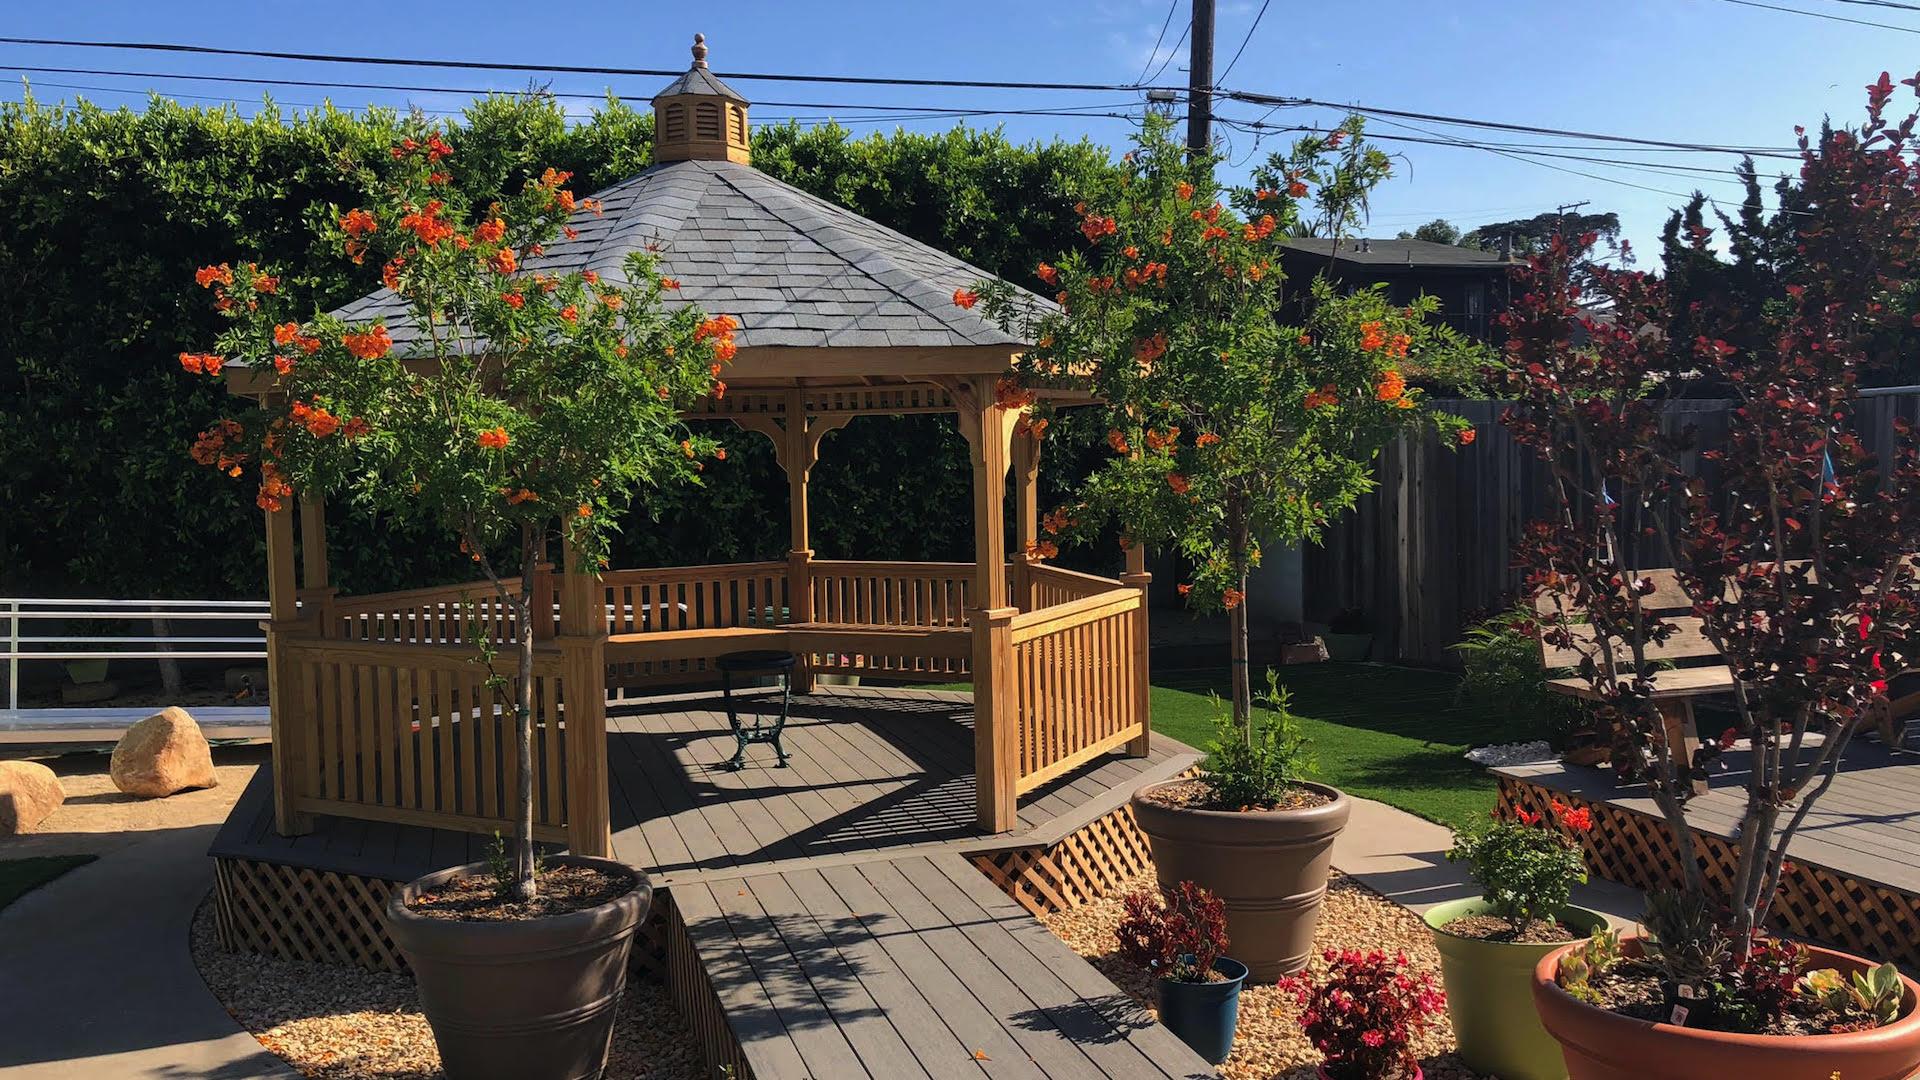 gazebos as a shade structure by EcoLawn Santa Barbara